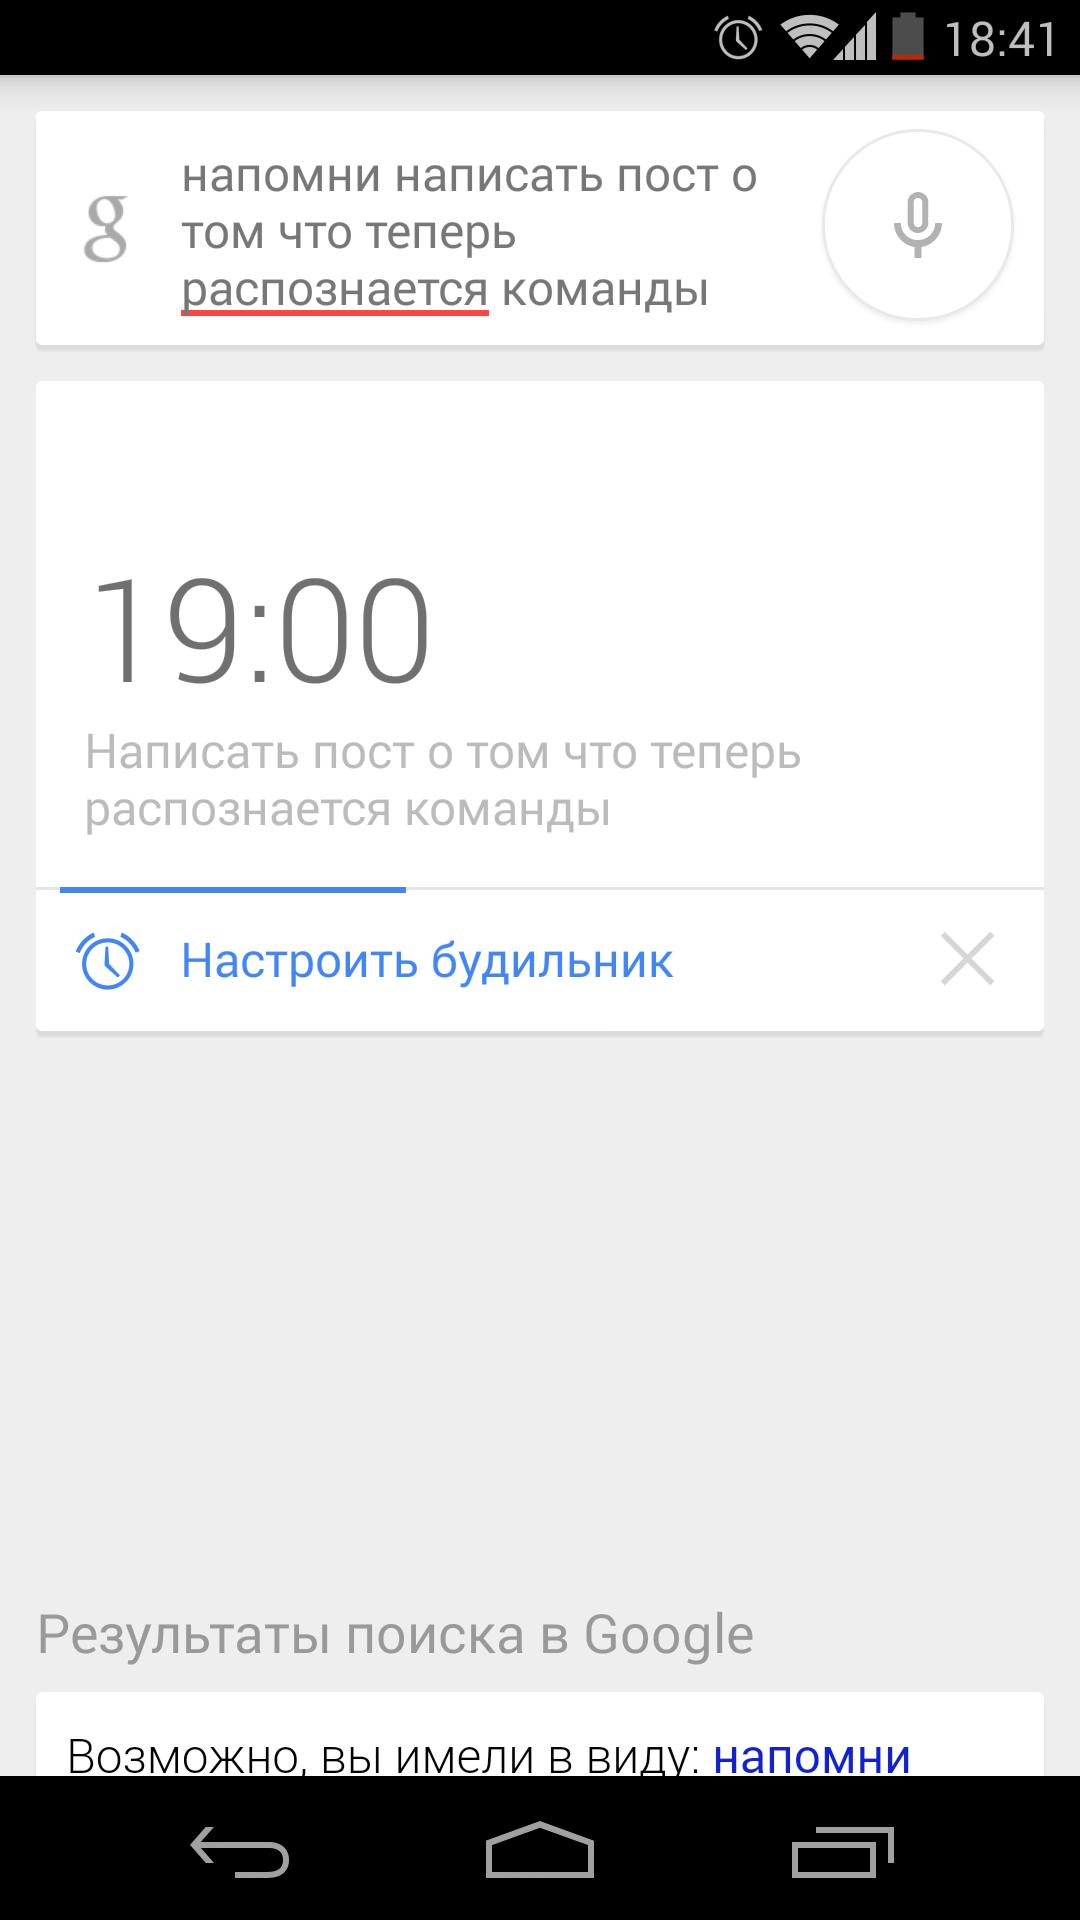 Screenshot_2013-12-11-18-41-09